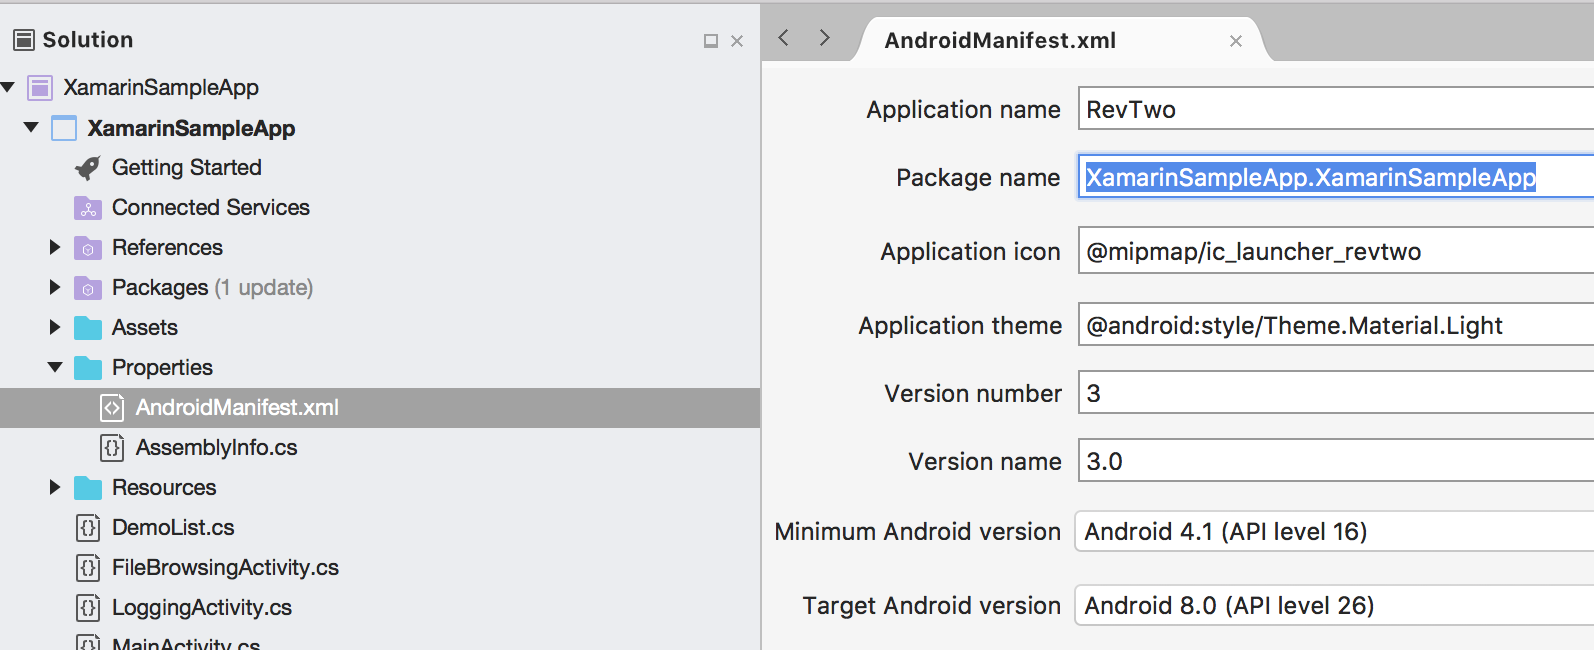 Xamarin Android Sample App